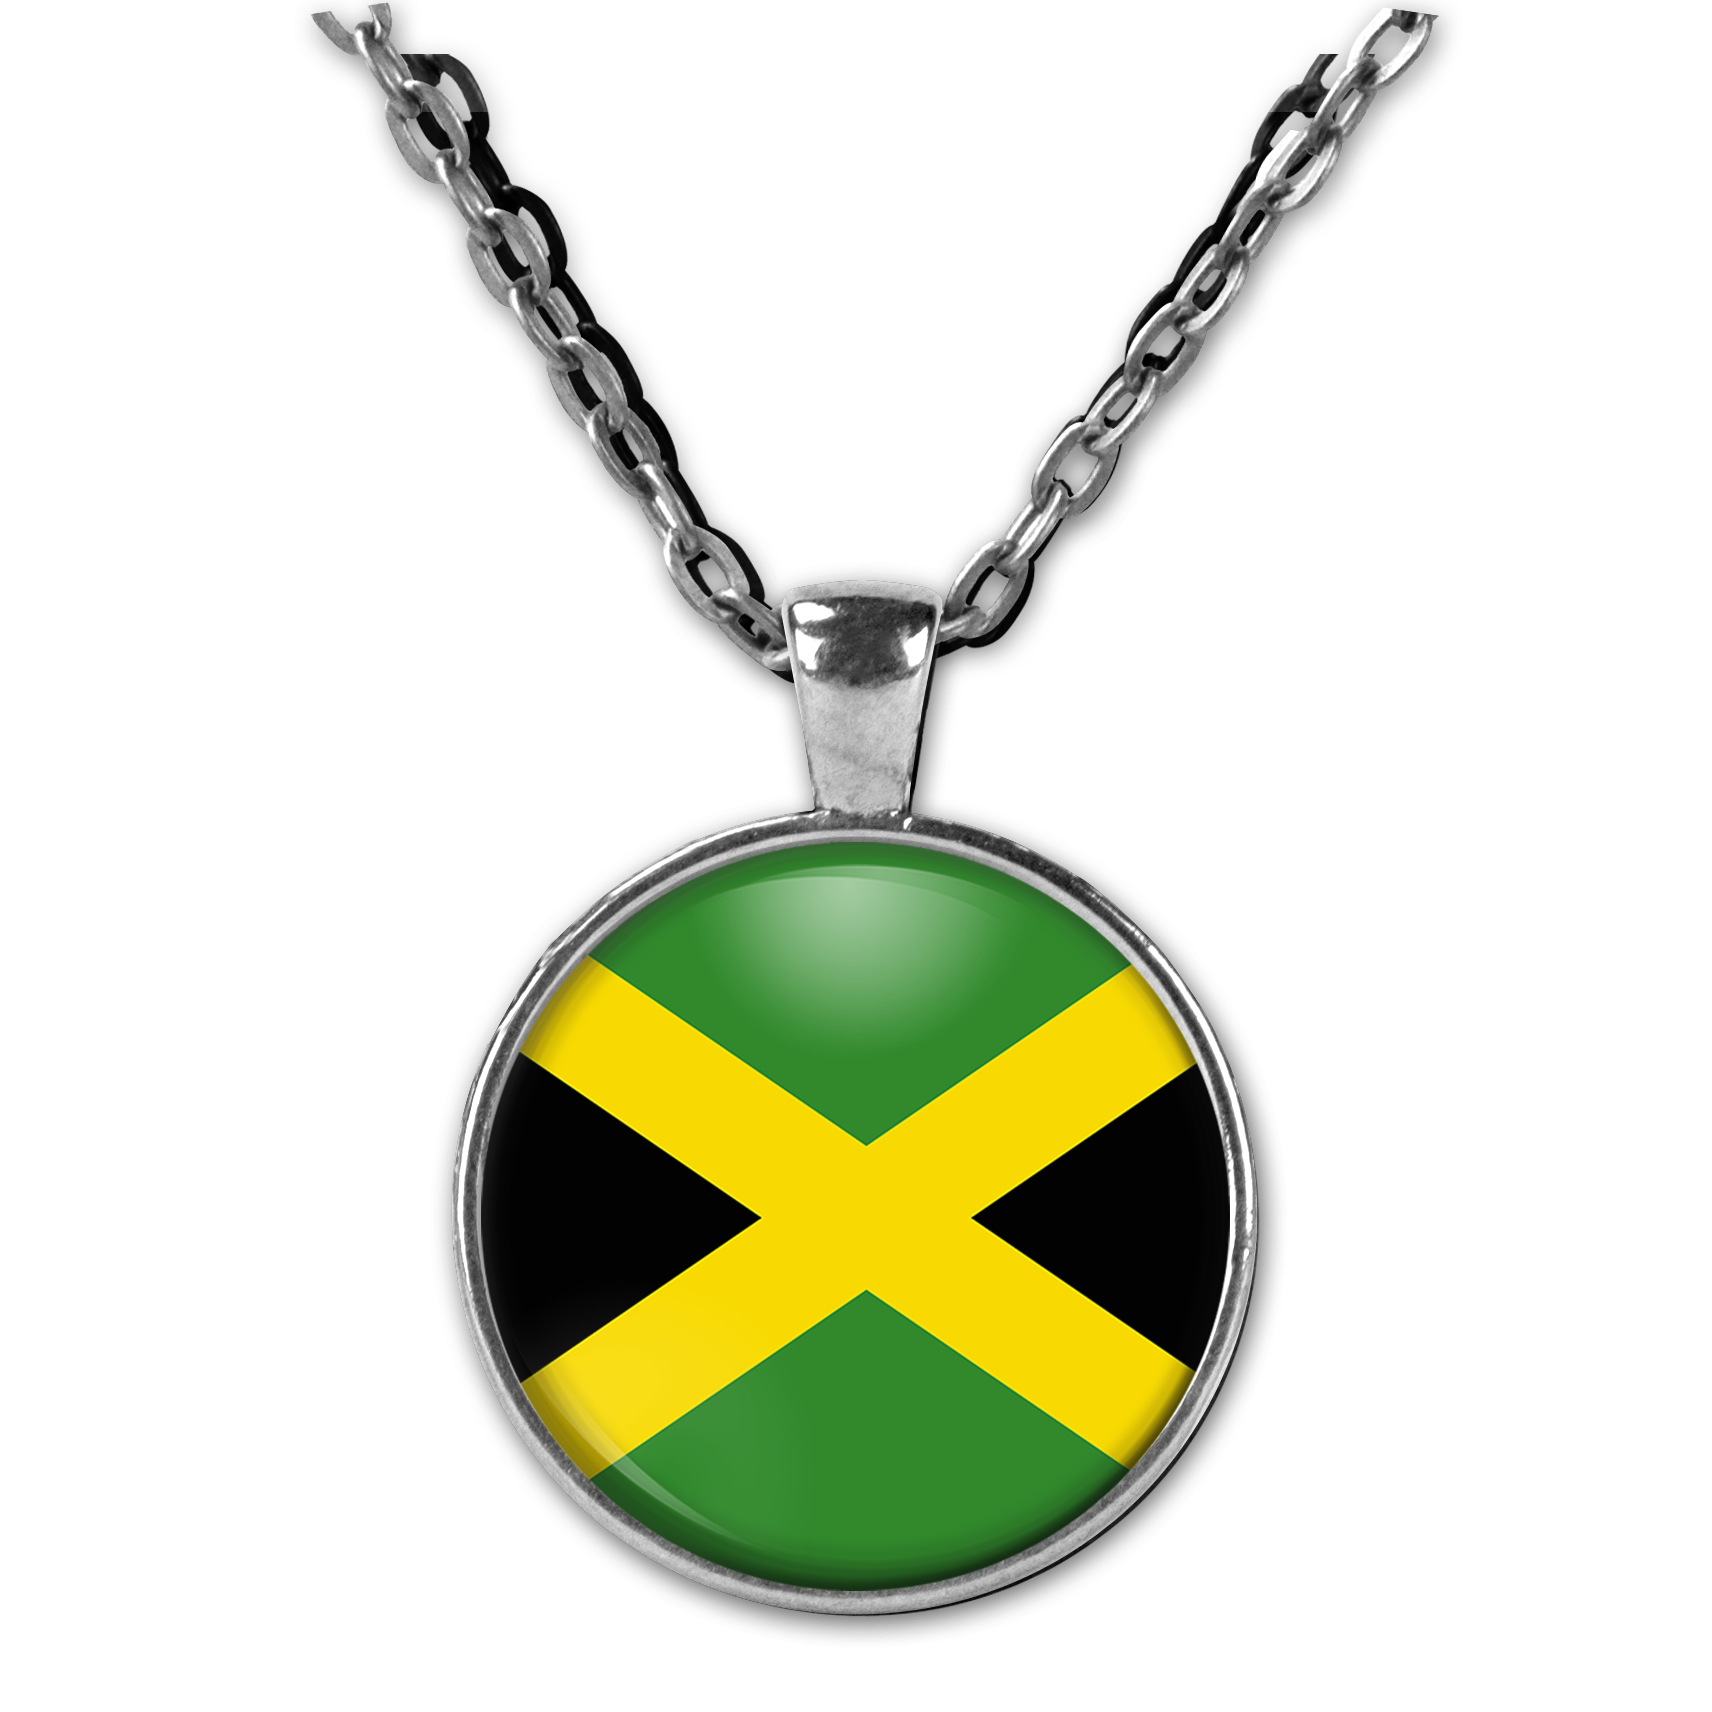 Jamaica Foto Pribadi Kalung Wanita Gambar Perhiasan Kalung Liontin Kalung Pria Memorial Foto Hadiah